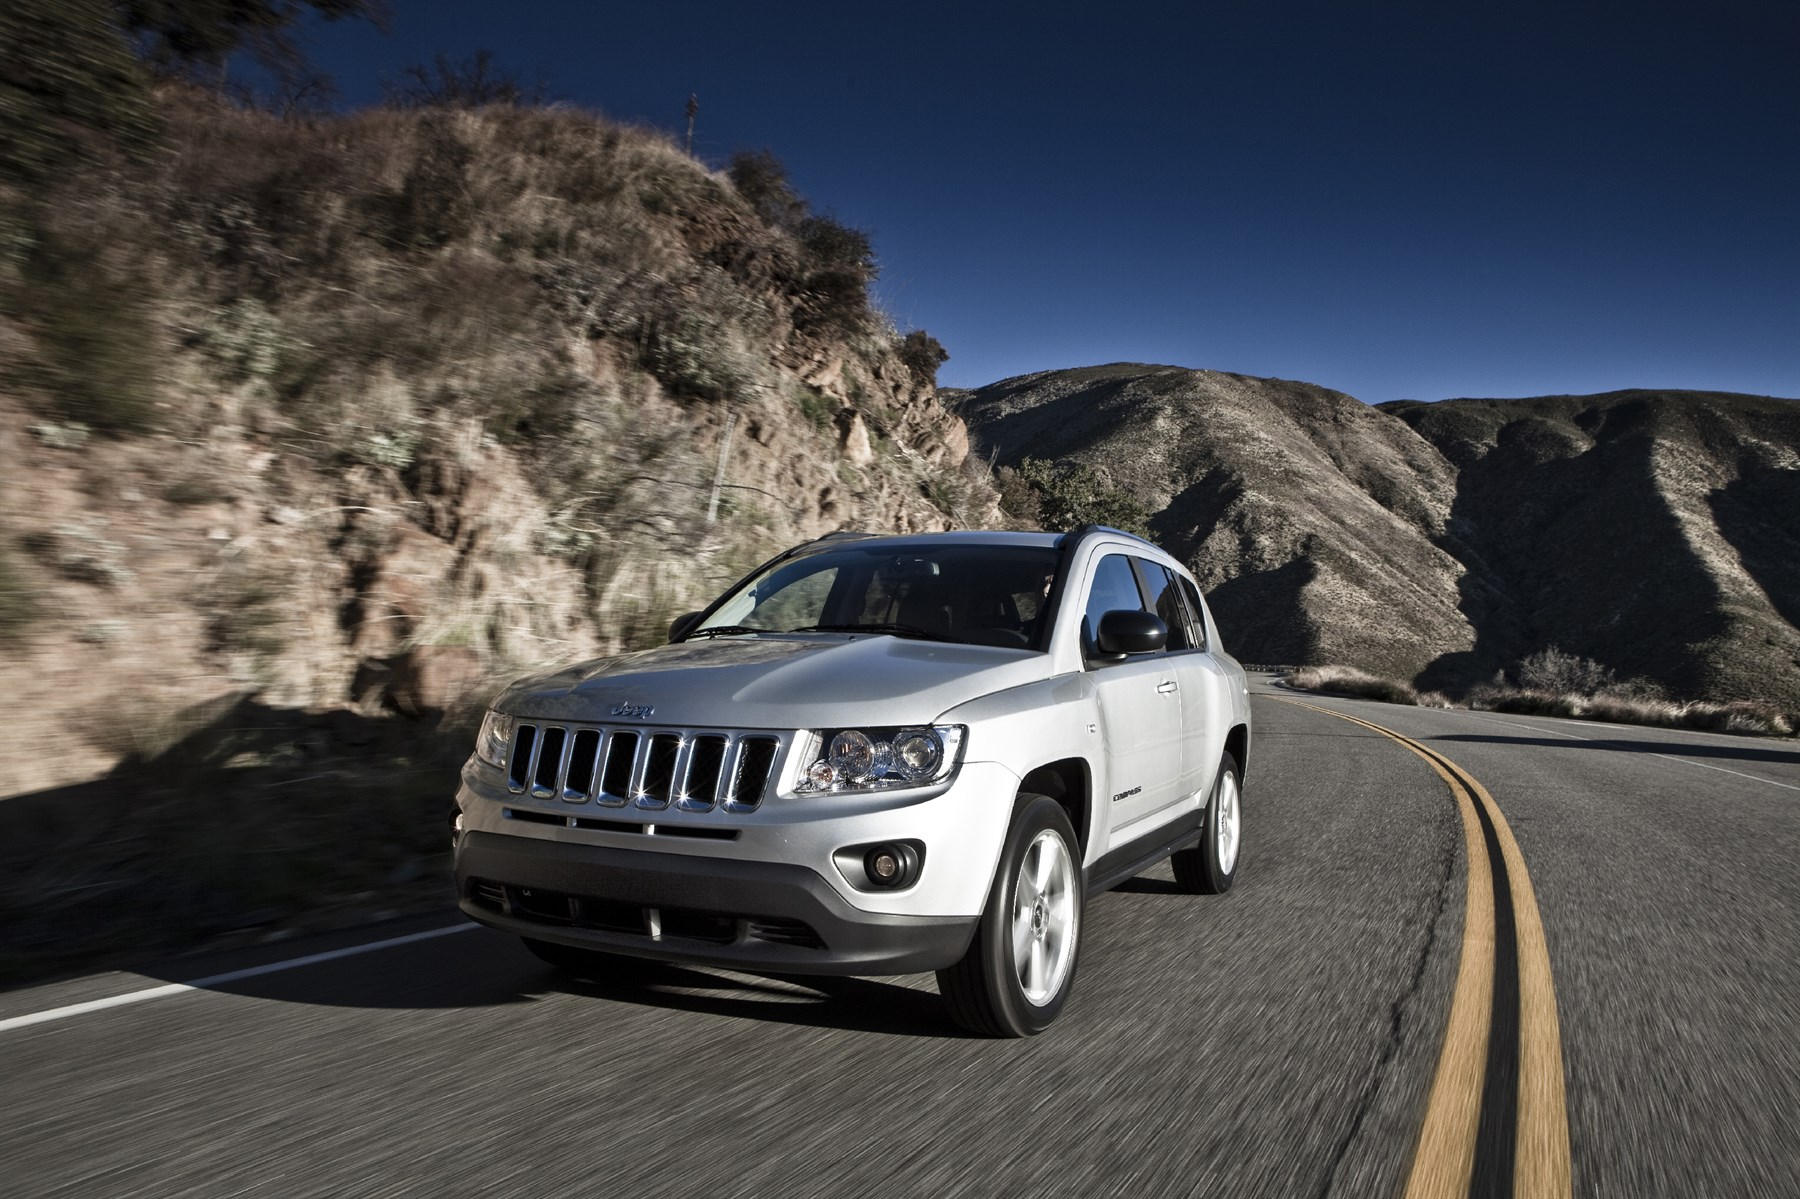 Jeep Compass (Photo: Quickpic)